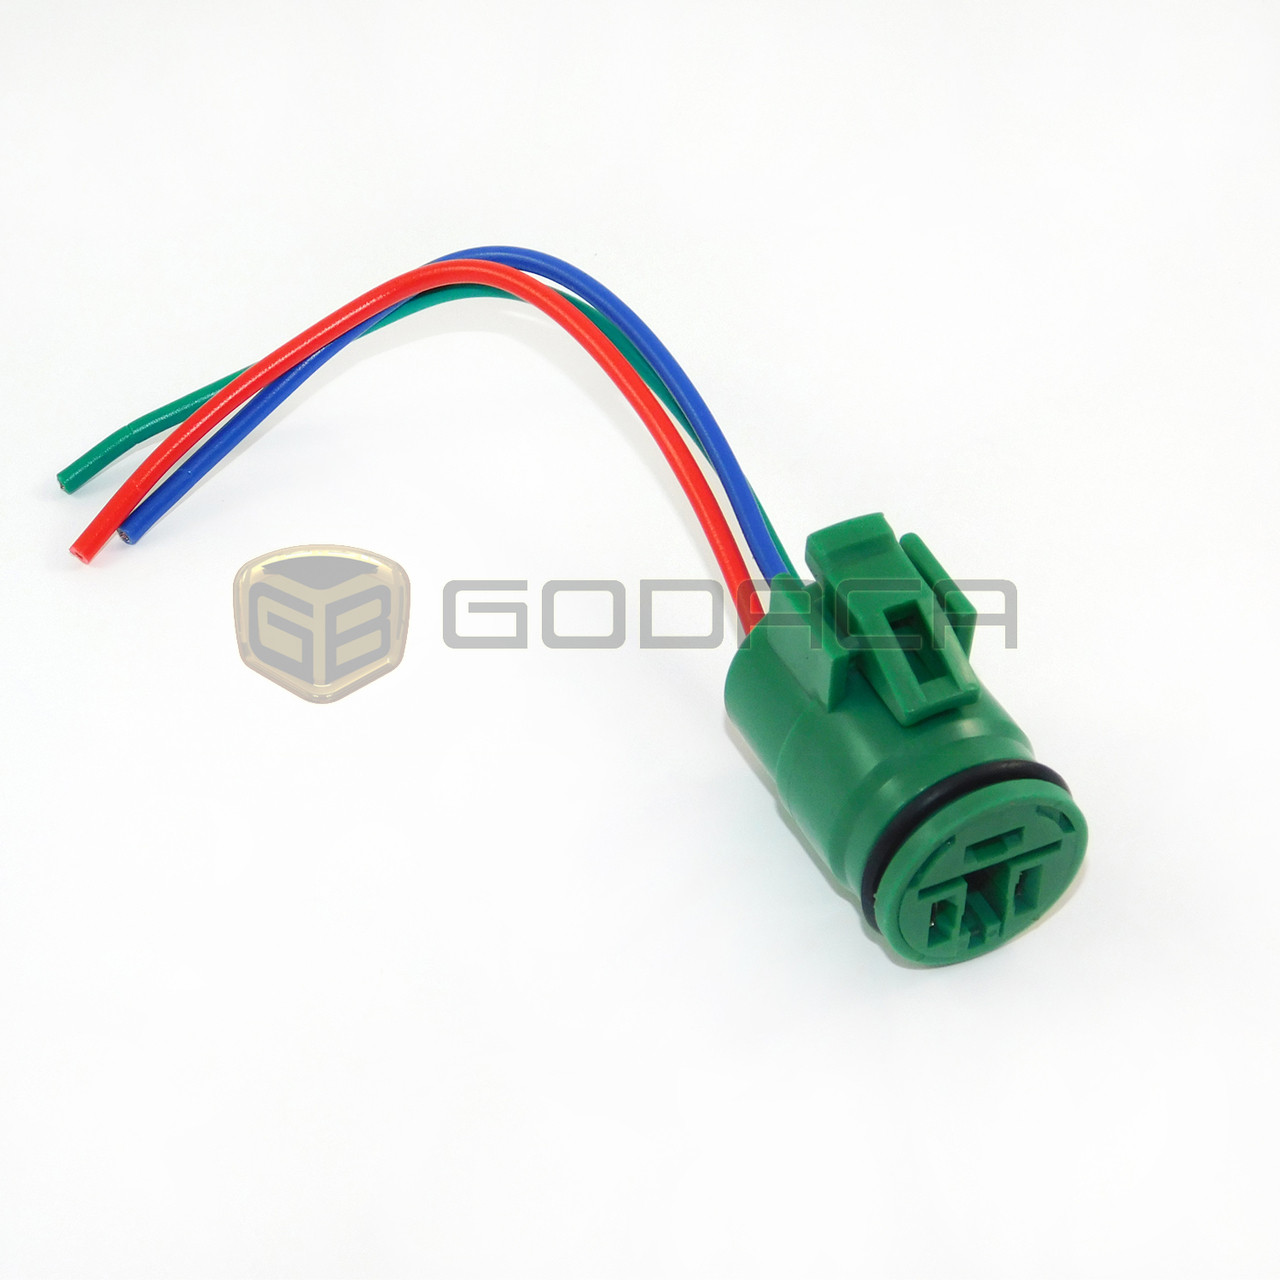 small resolution of 1x connector 3 way 3 pin for toyota alternator 90980 10341 godaca llc